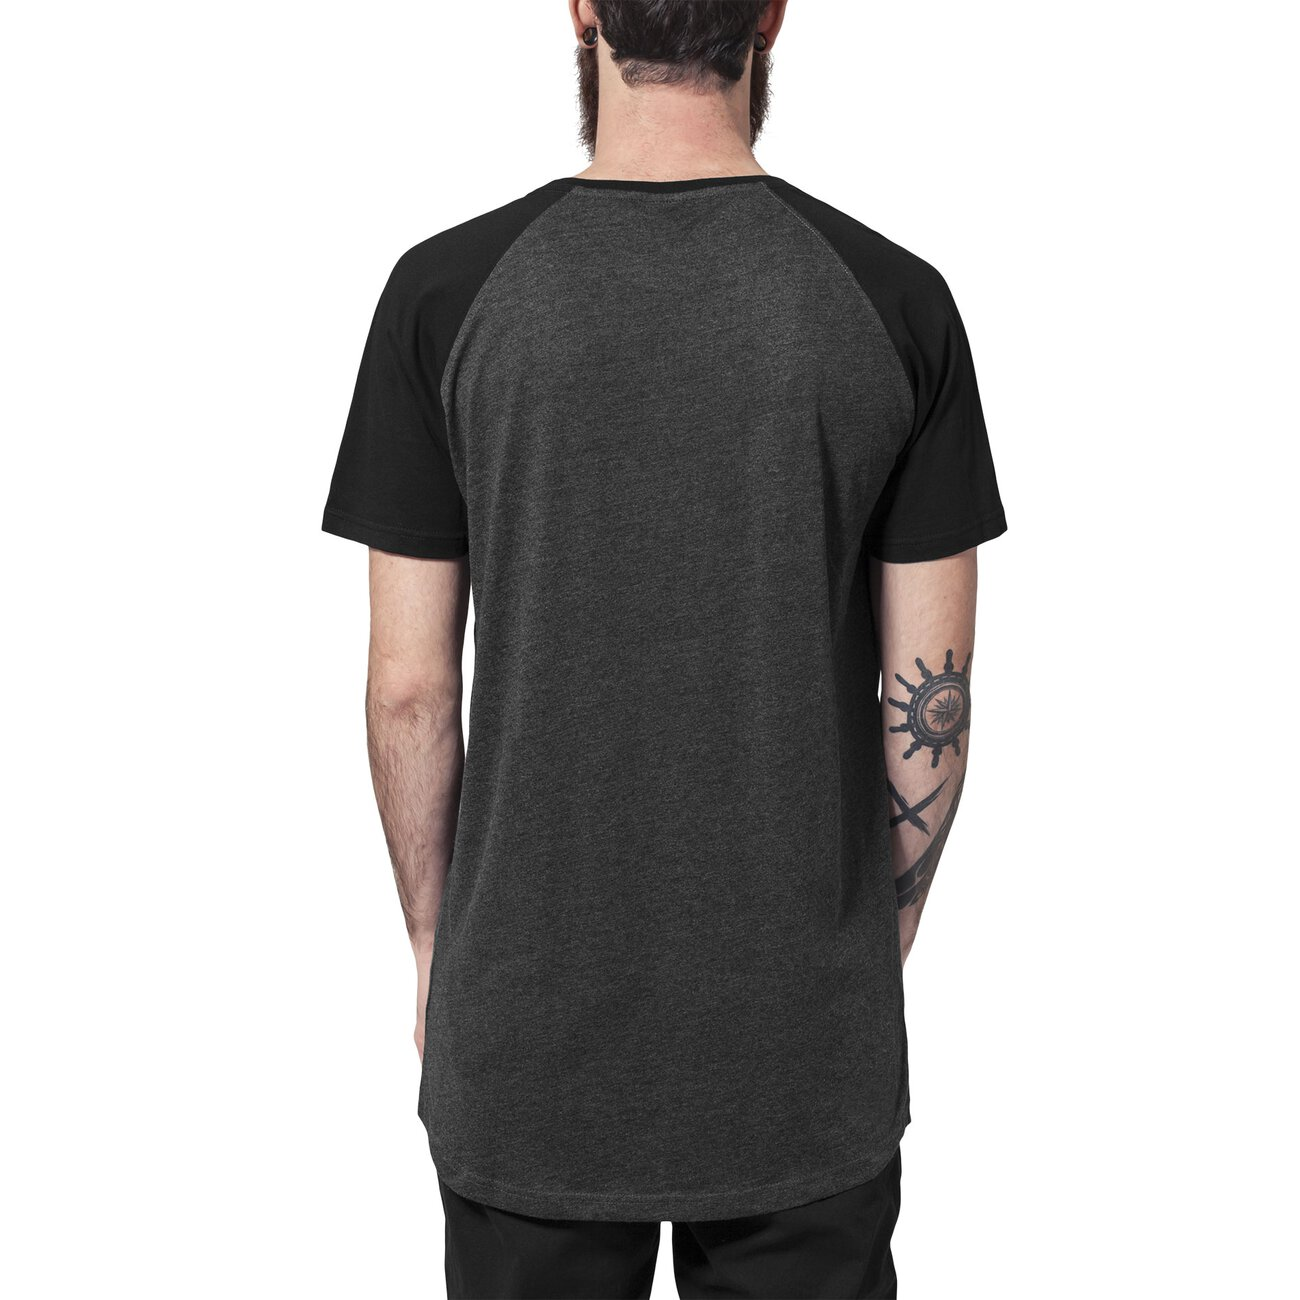 urban classics t shirt long style shaped basic raglan shirt tb 966. Black Bedroom Furniture Sets. Home Design Ideas